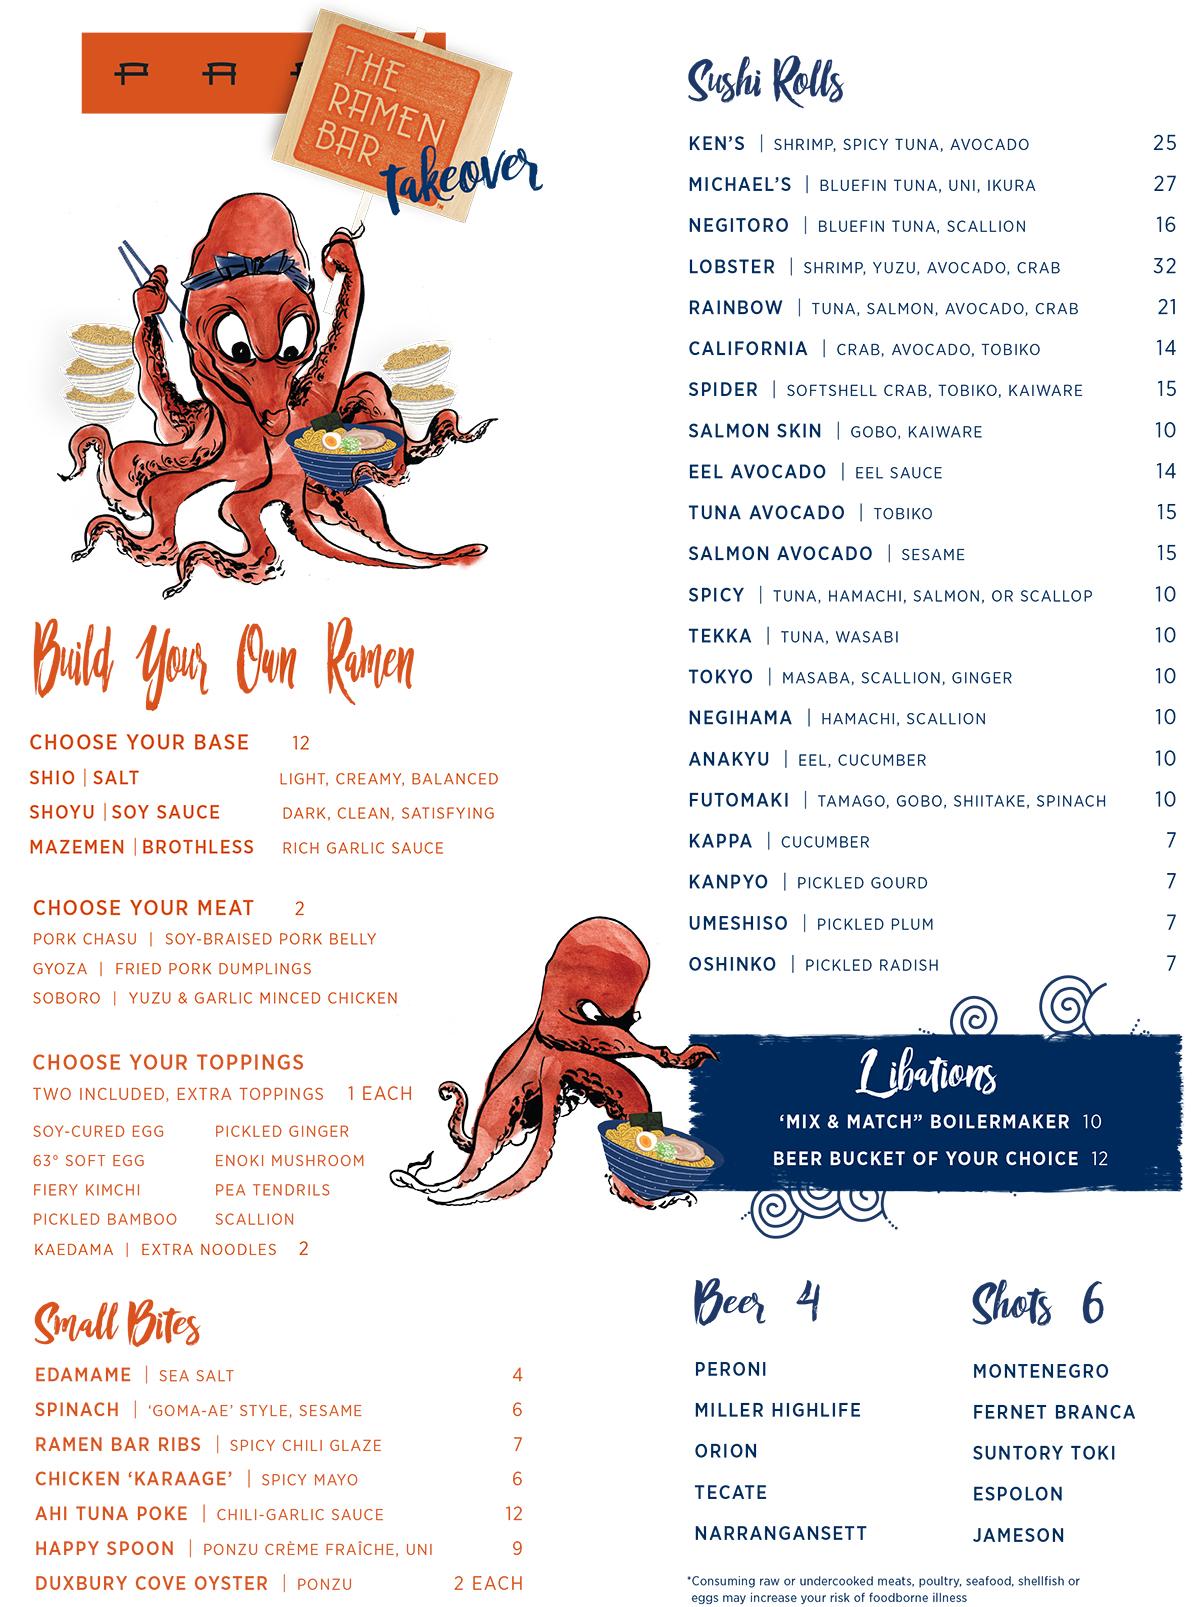 The Ramen Bar menu pabu